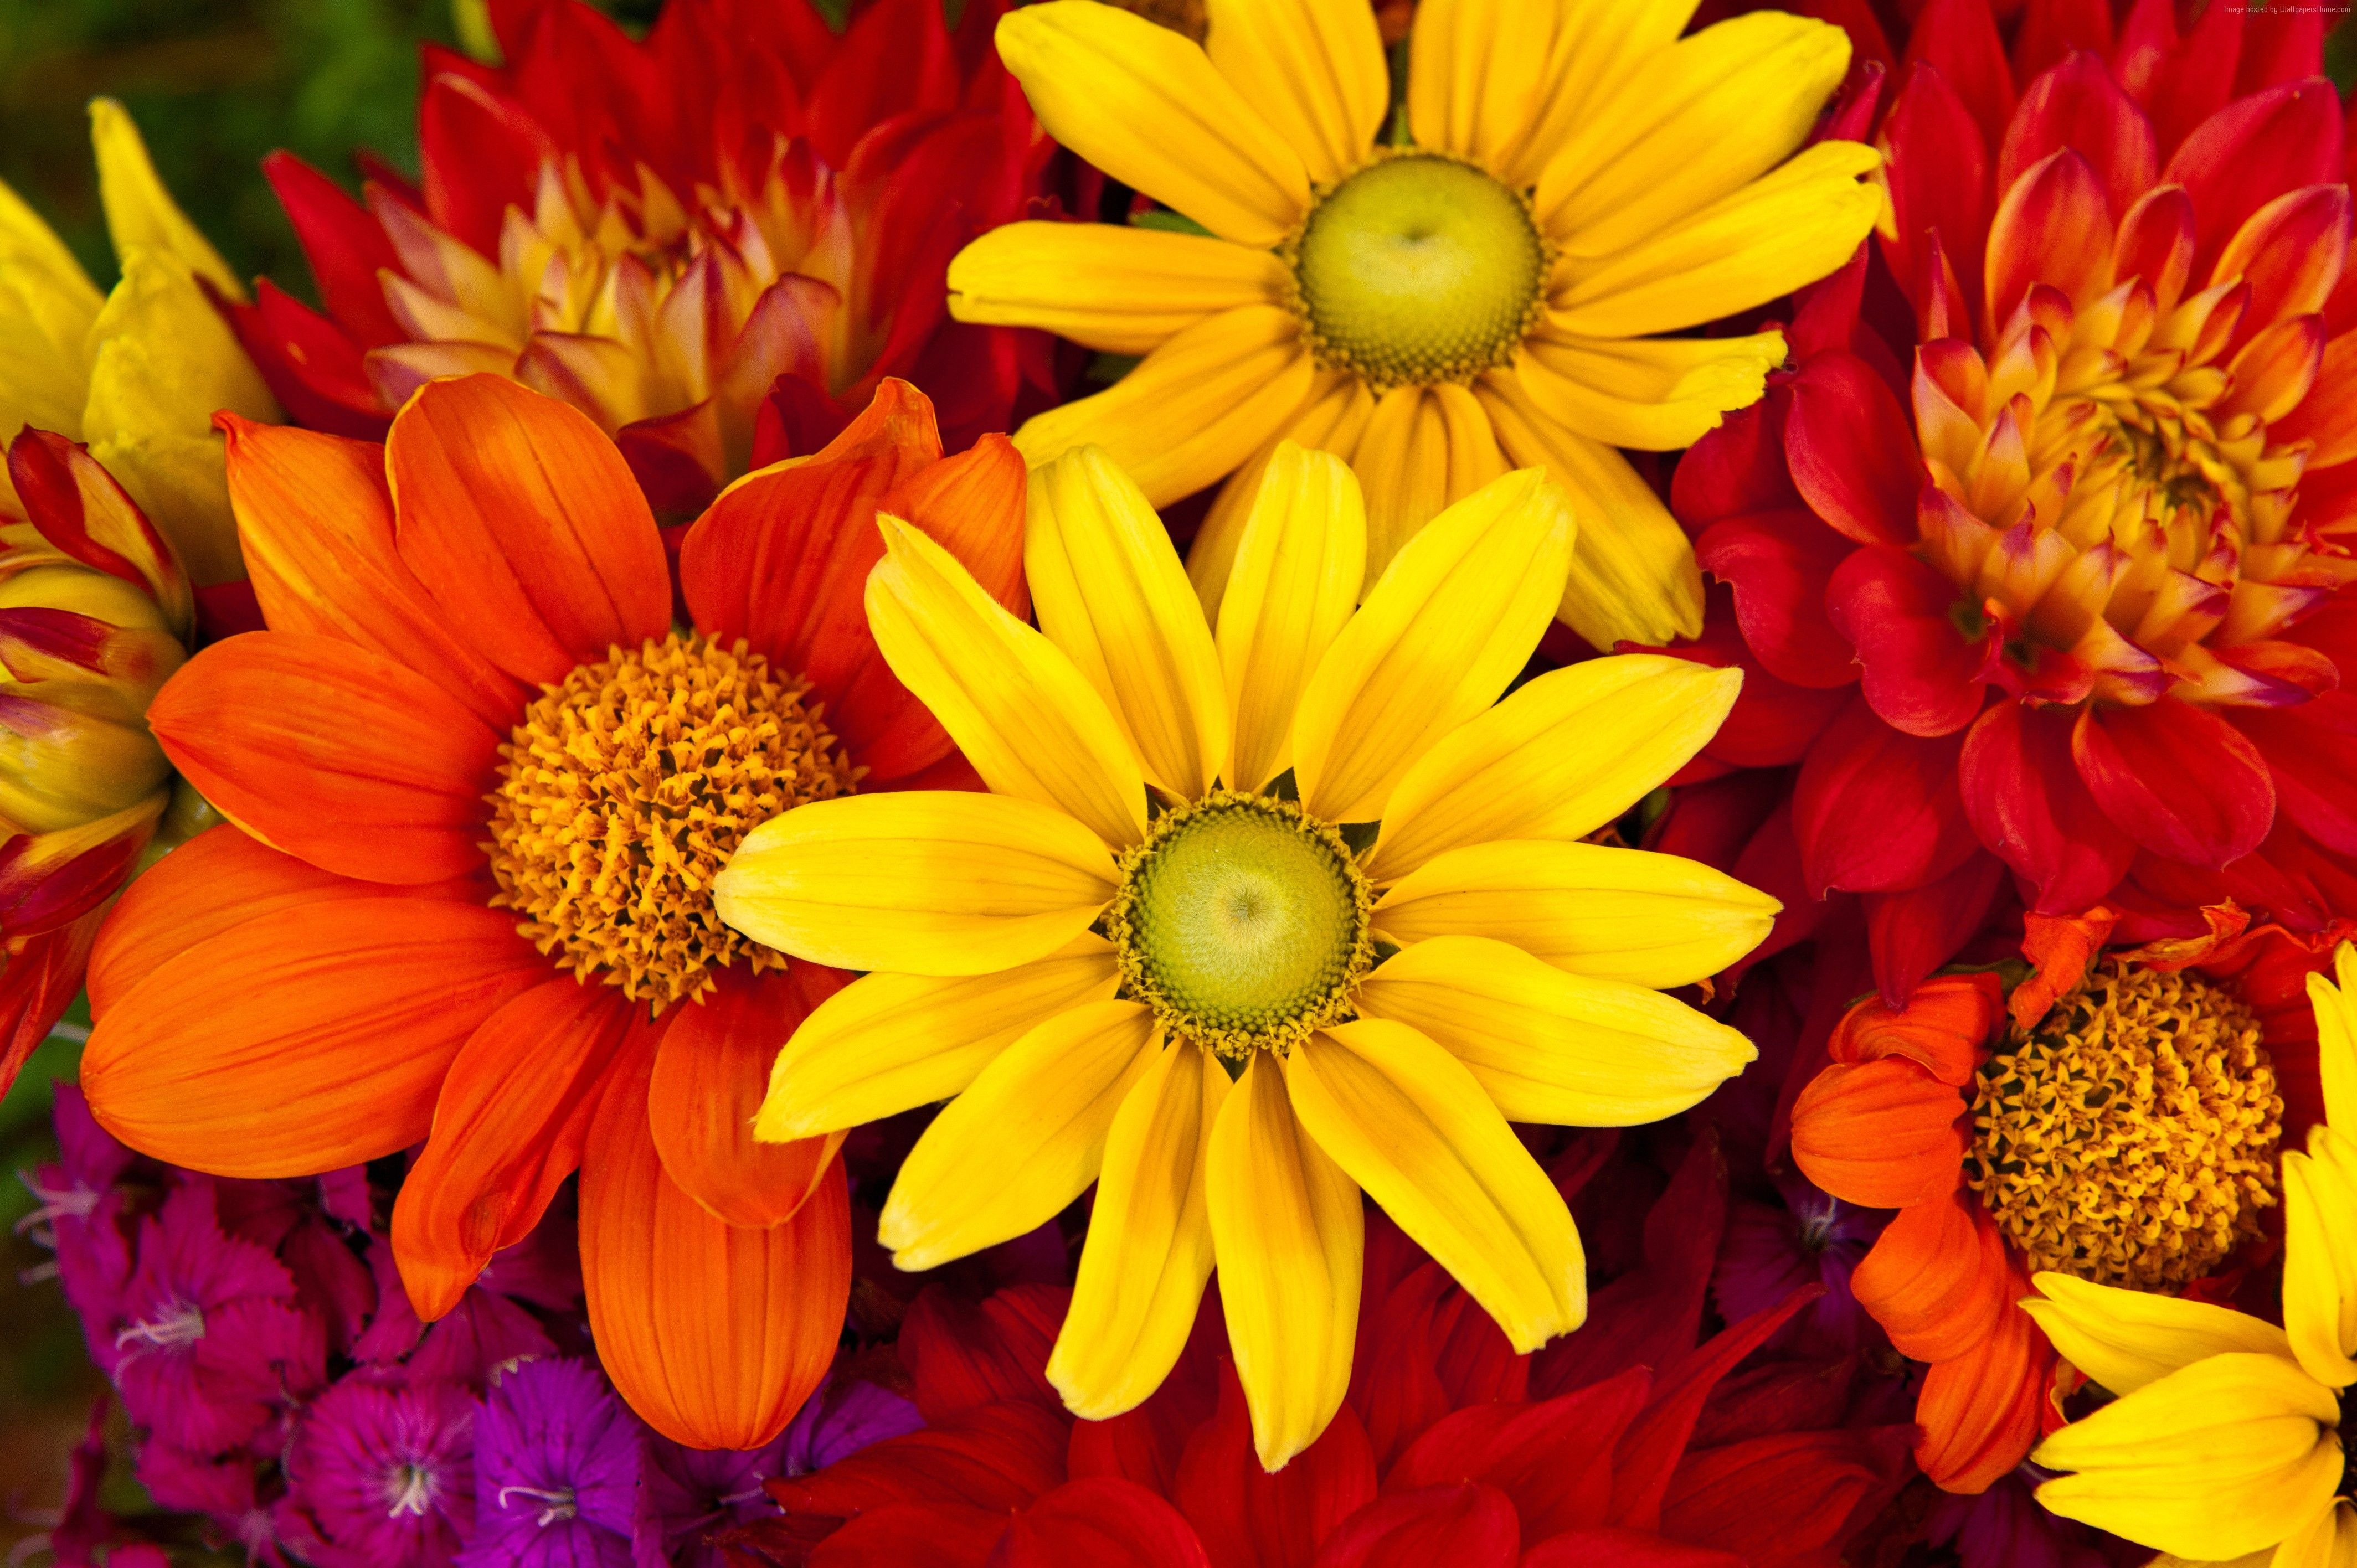 Fall Flowers Desktop Wallpapers Top Free Fall Flowers Desktop Backgrounds Wallpaperaccess